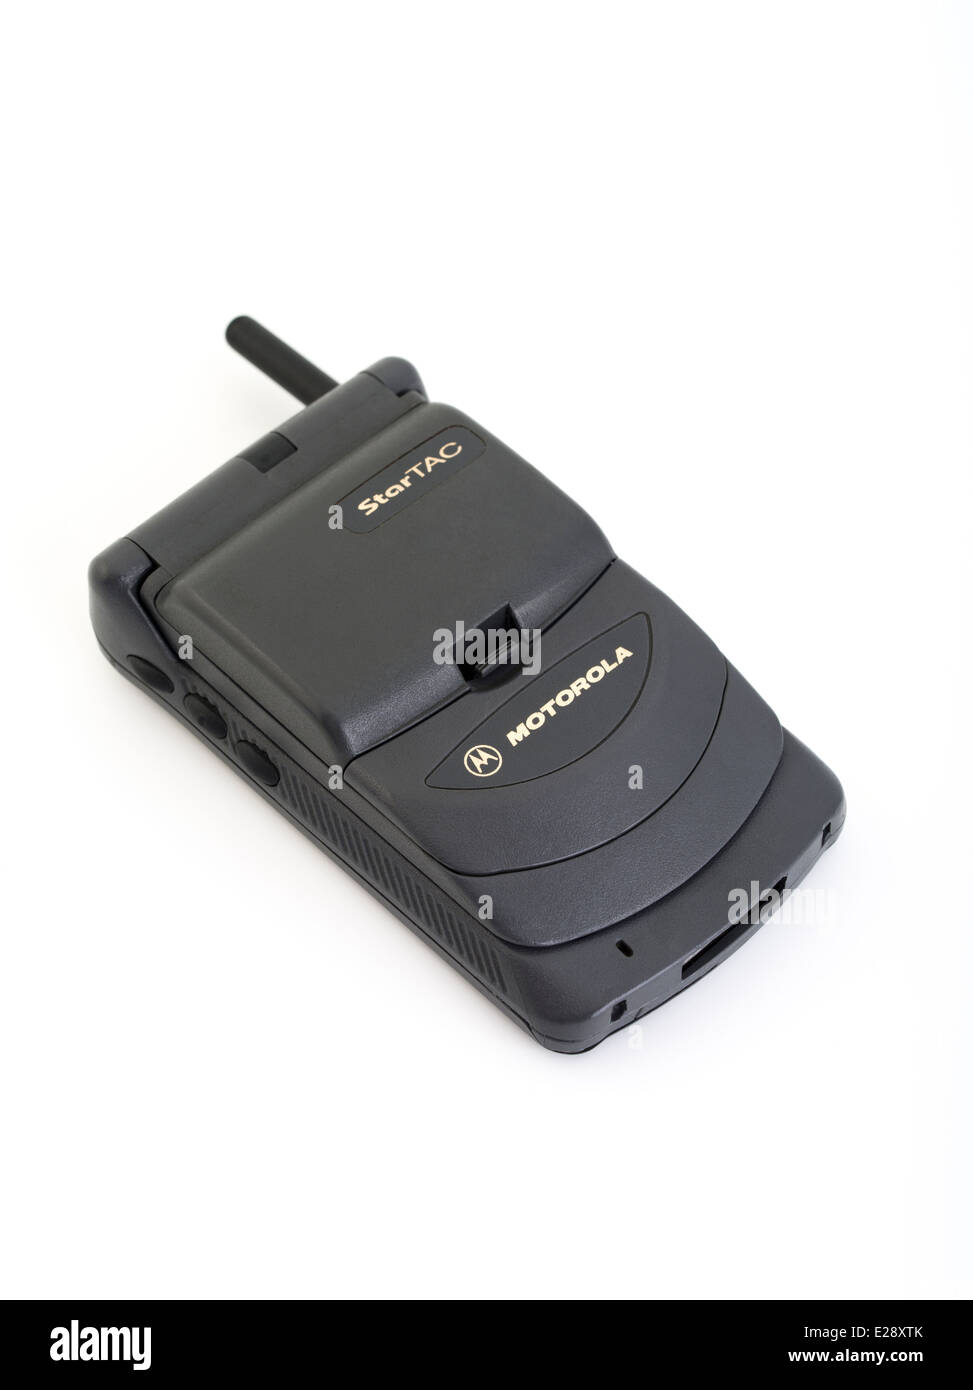 first motorola startac. motorola startac star tac 85. first clamshell / flip mobile phone released 1996 startac 3